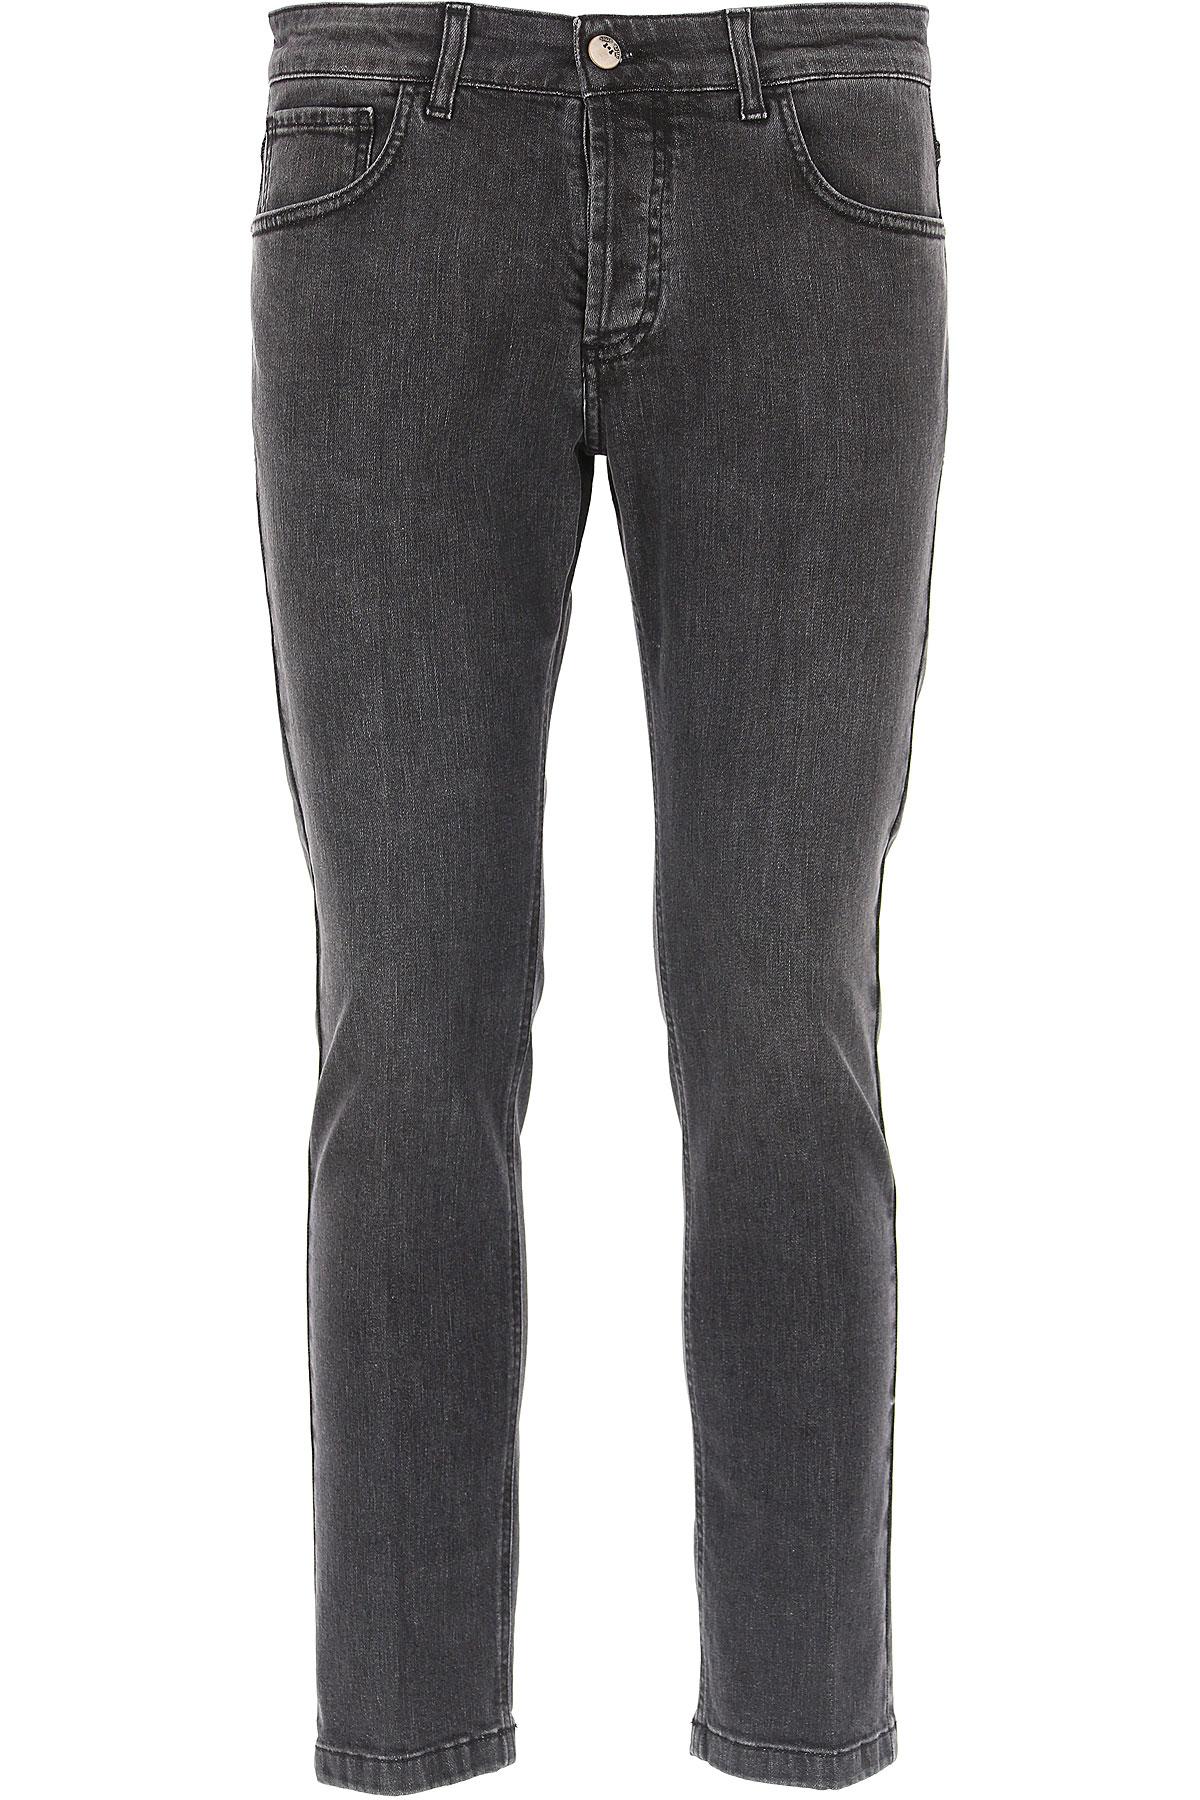 Image of Entre Amis Jeans, Grey, Cotton, 2017, 30 31 32 33 34 35 36 38